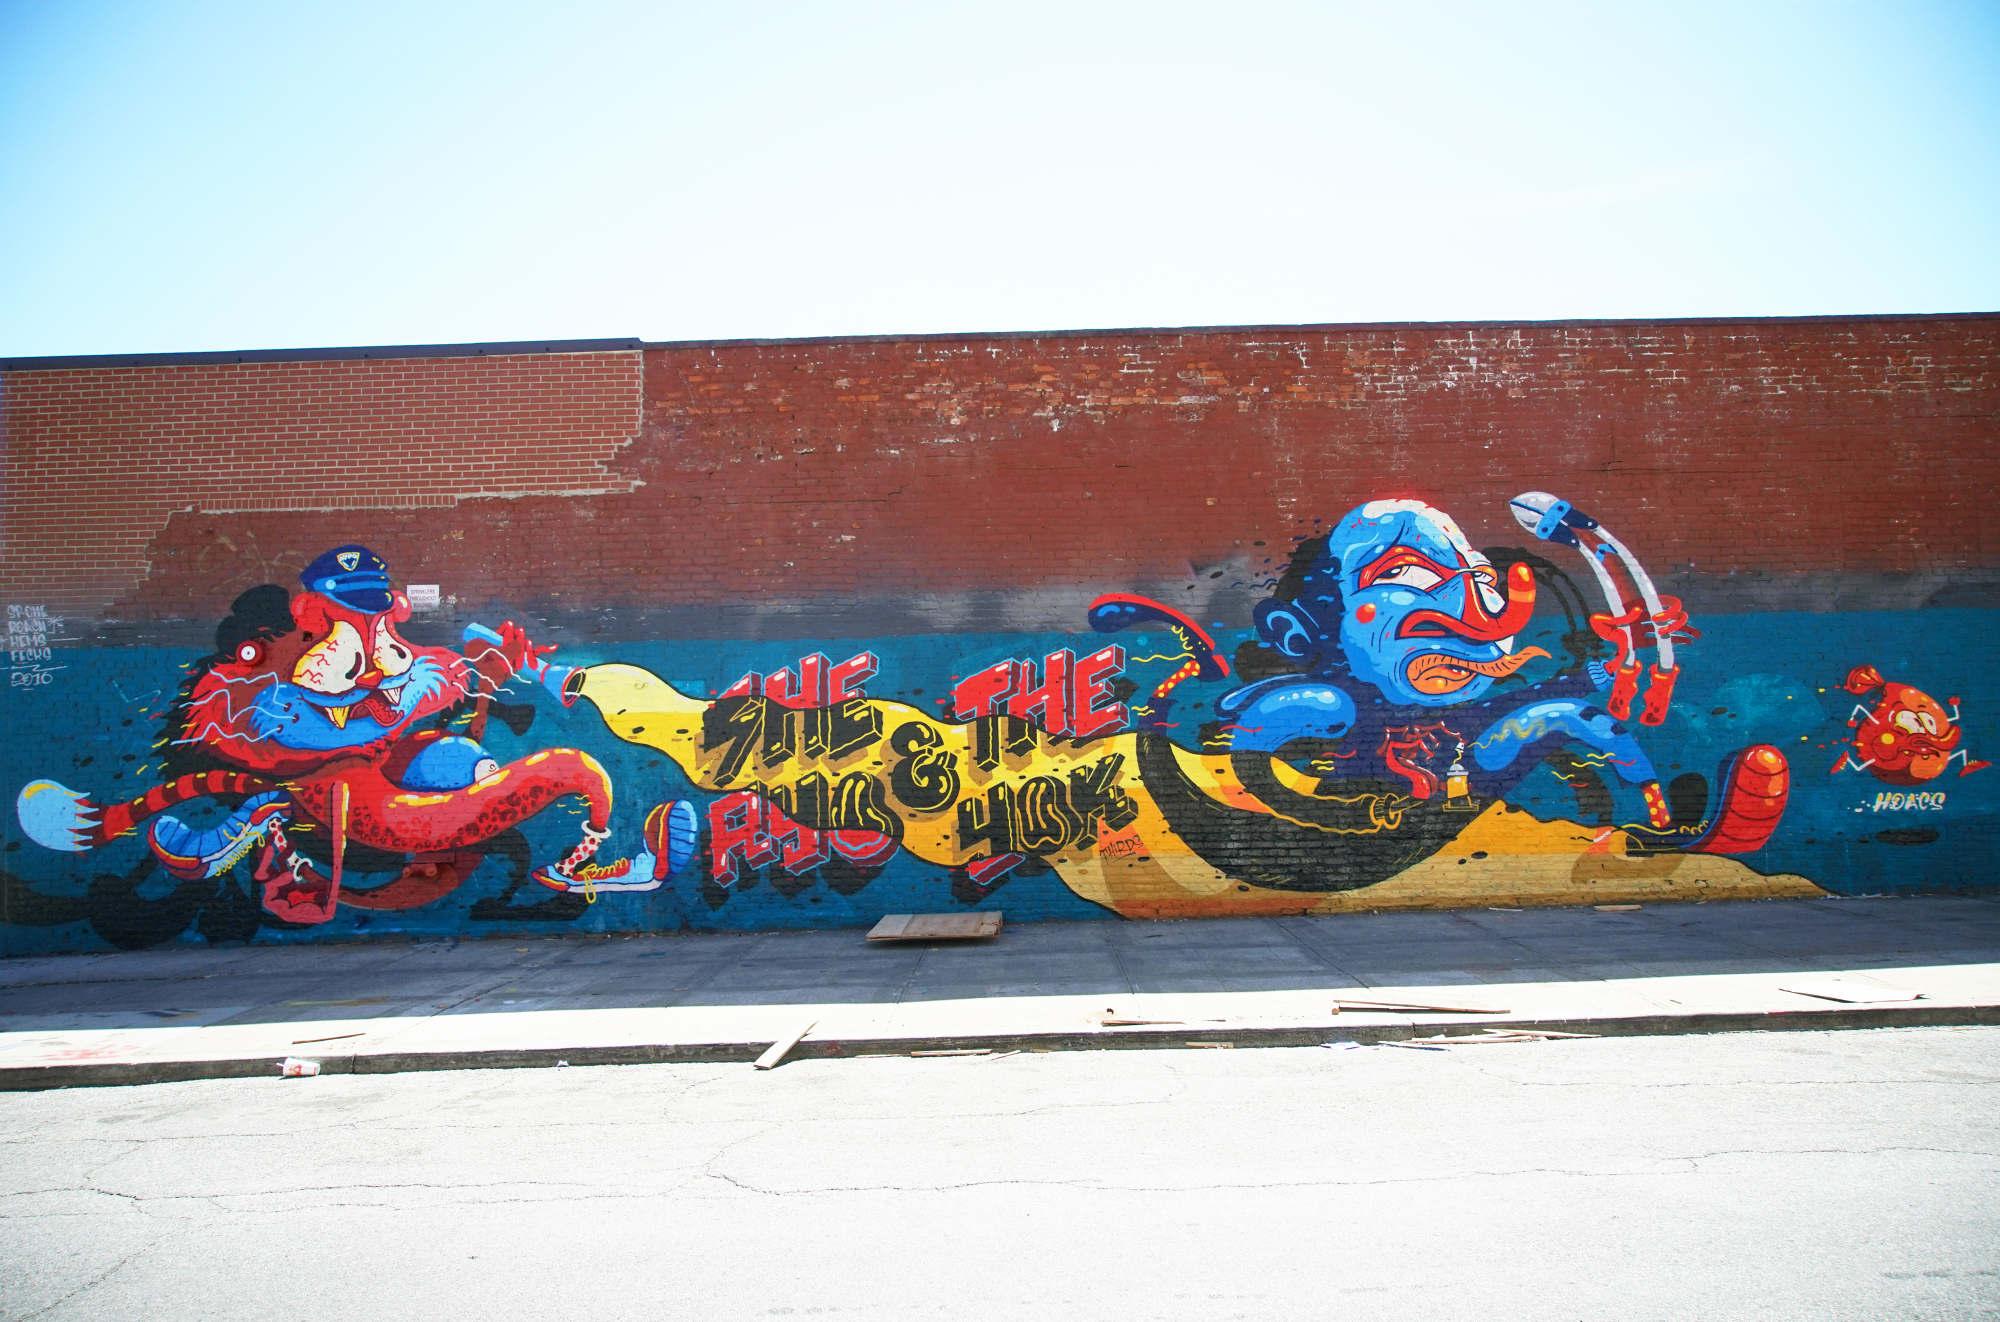 yok-sheryo-graffiti-cartoon-skateboard-7